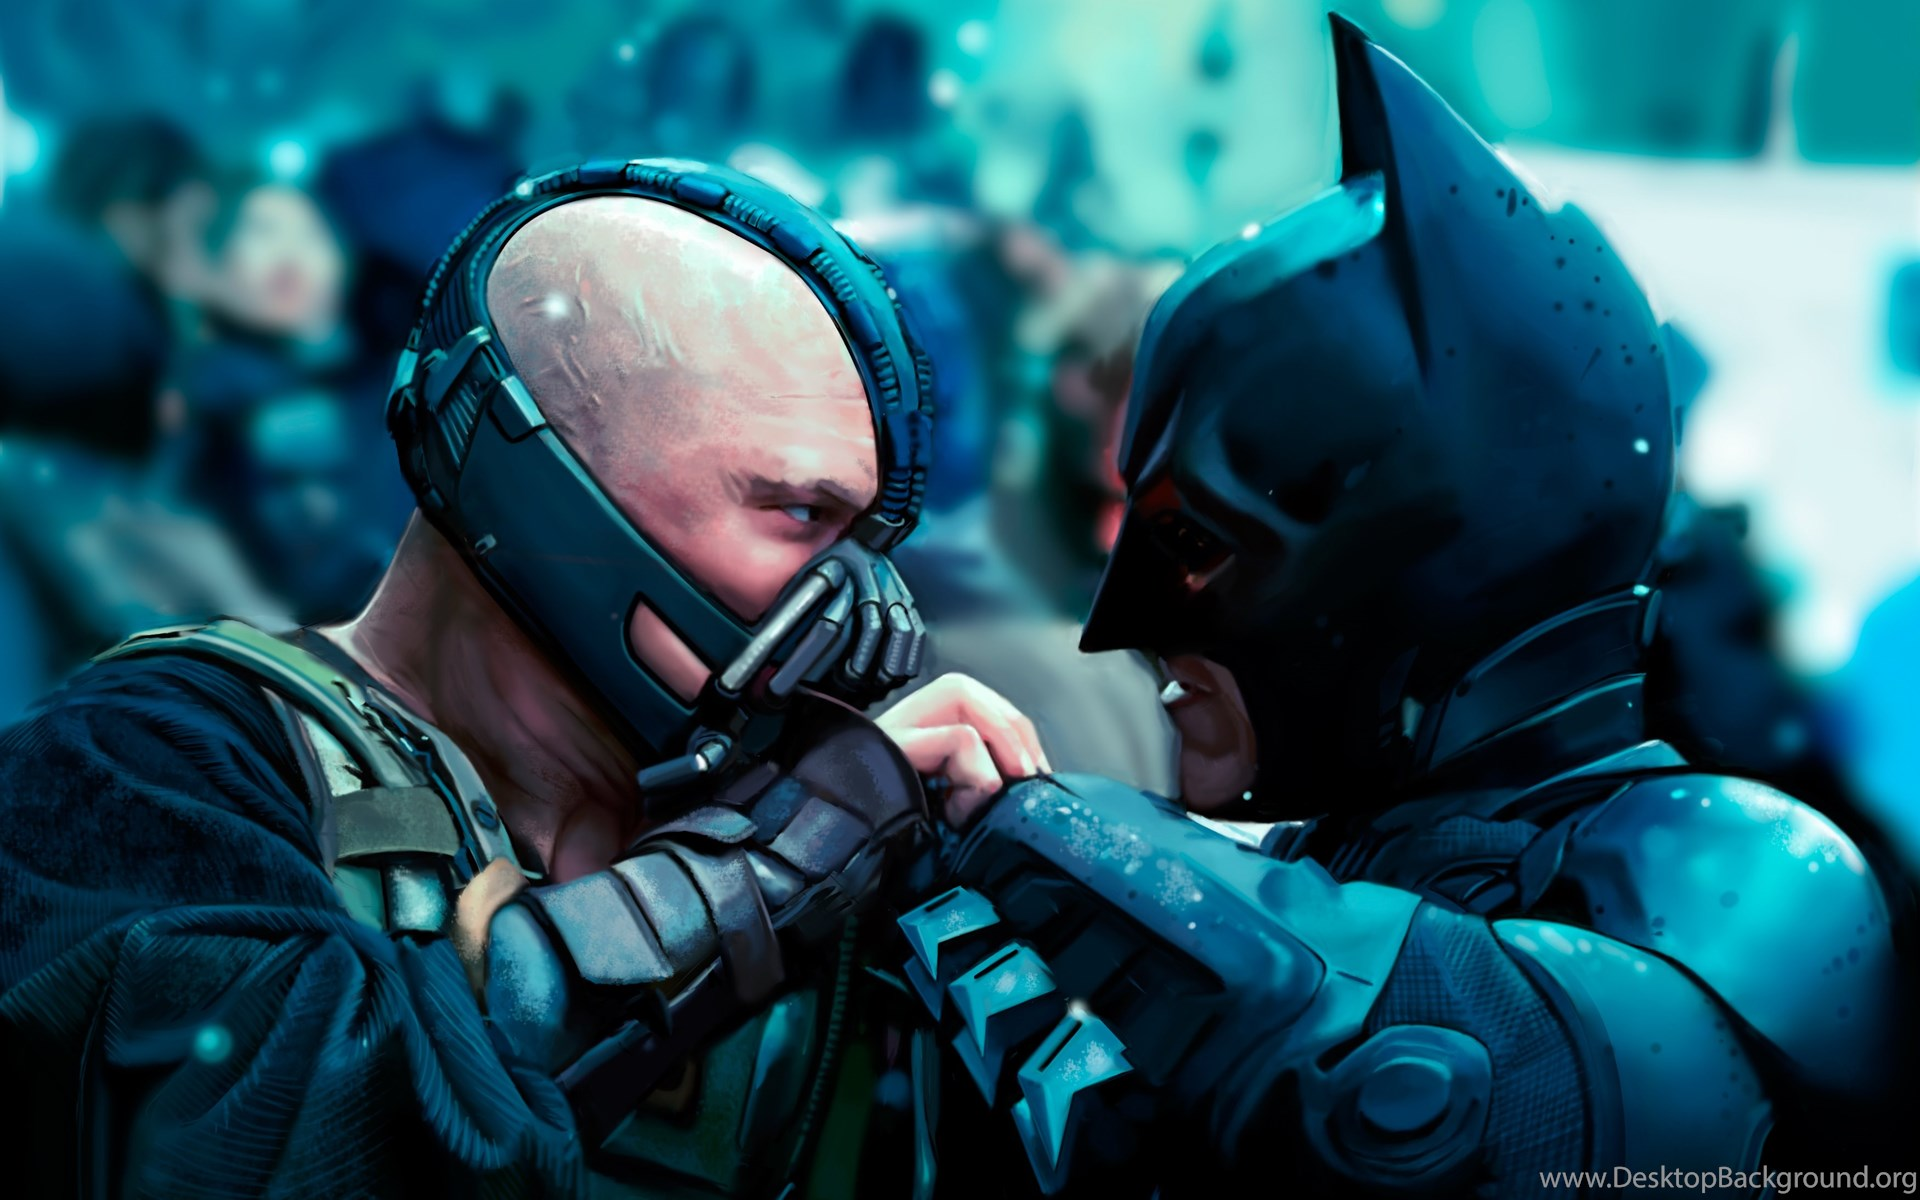 Bane Batman Dark Knight Rises 4k Ultra Hd Wallpapers Free Hd Desktop Background